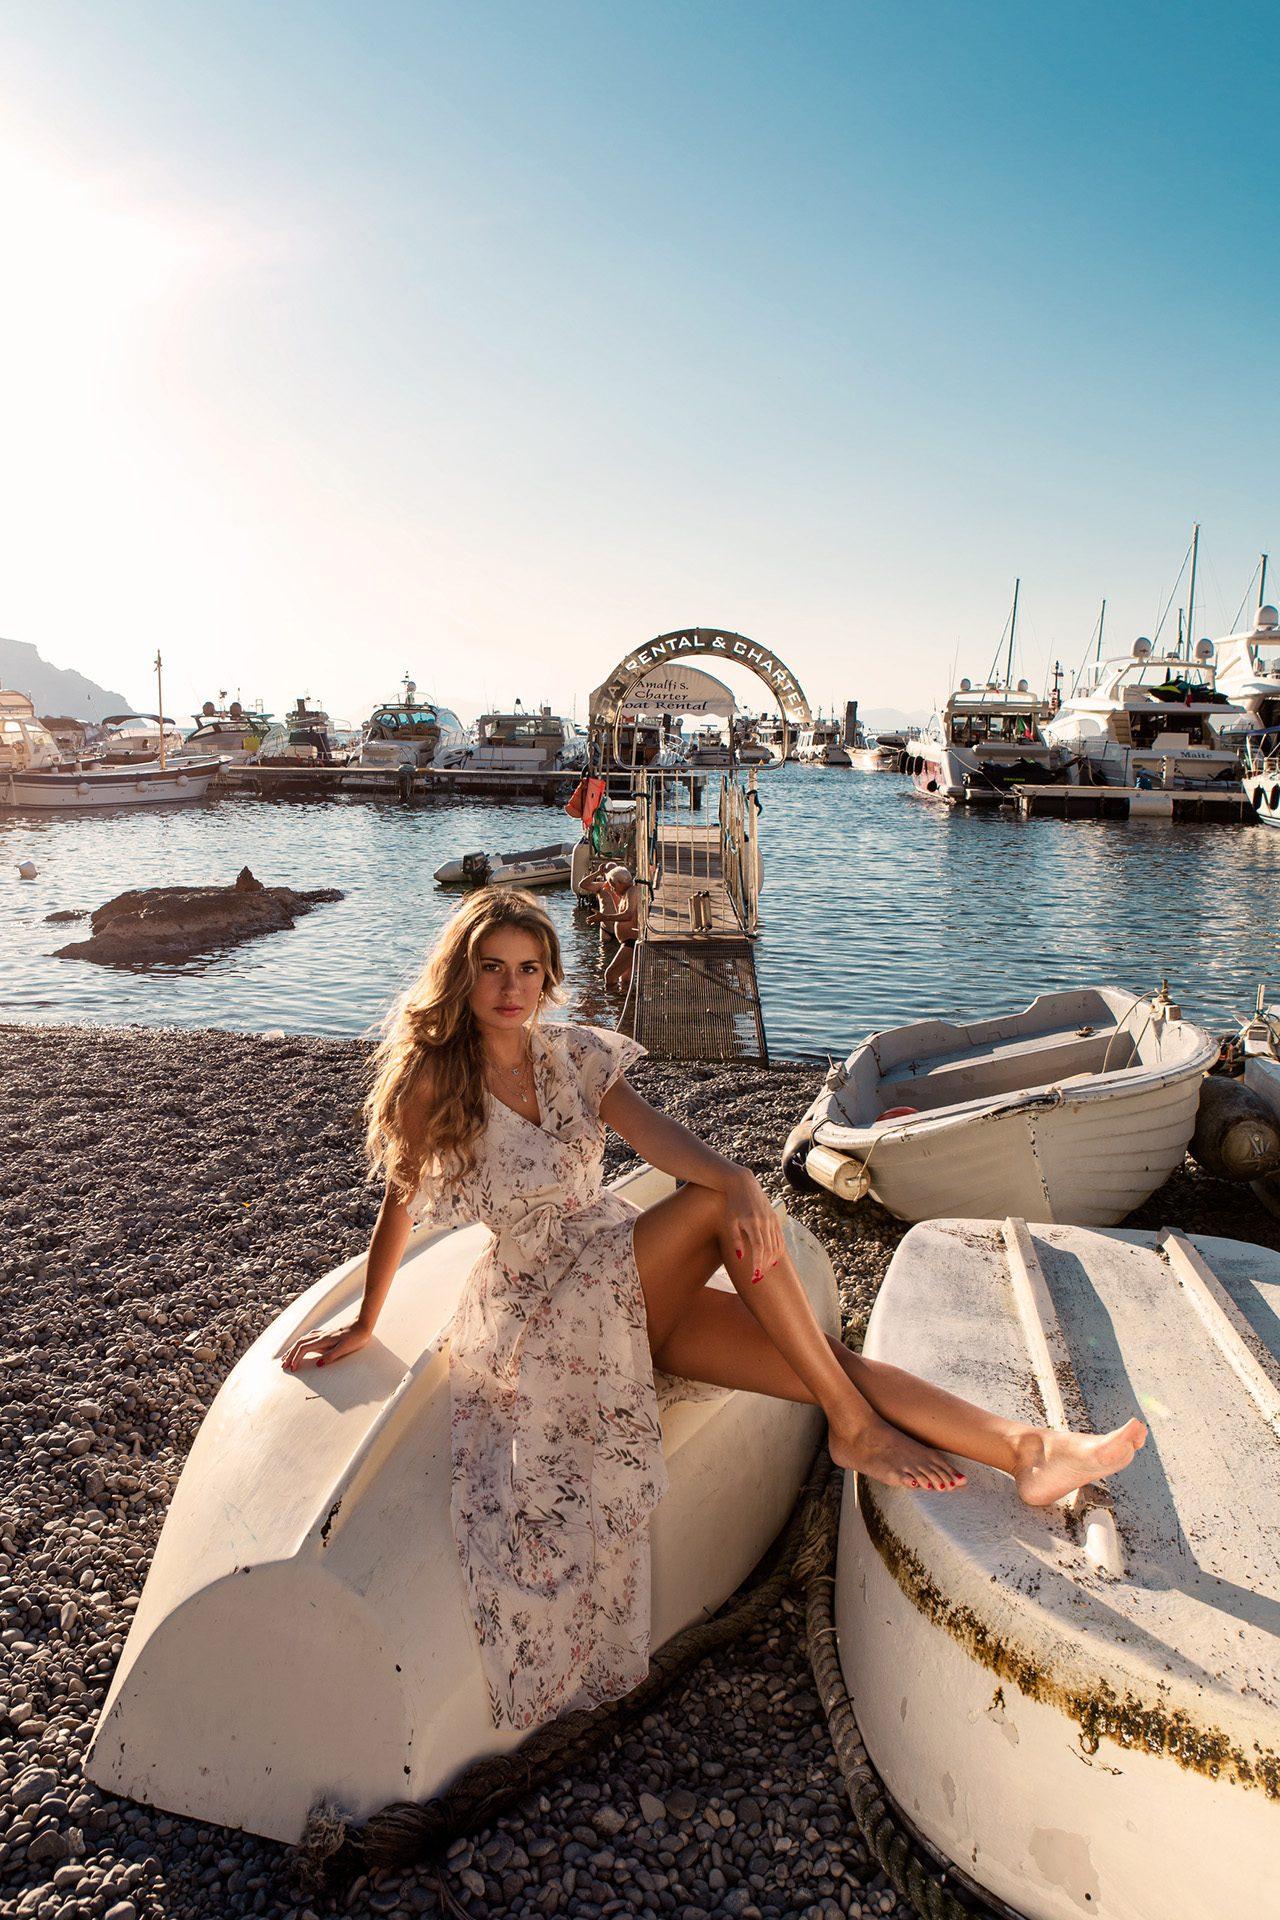 Chiara Stile - Tv Host, Journalist and Fashion Addicted